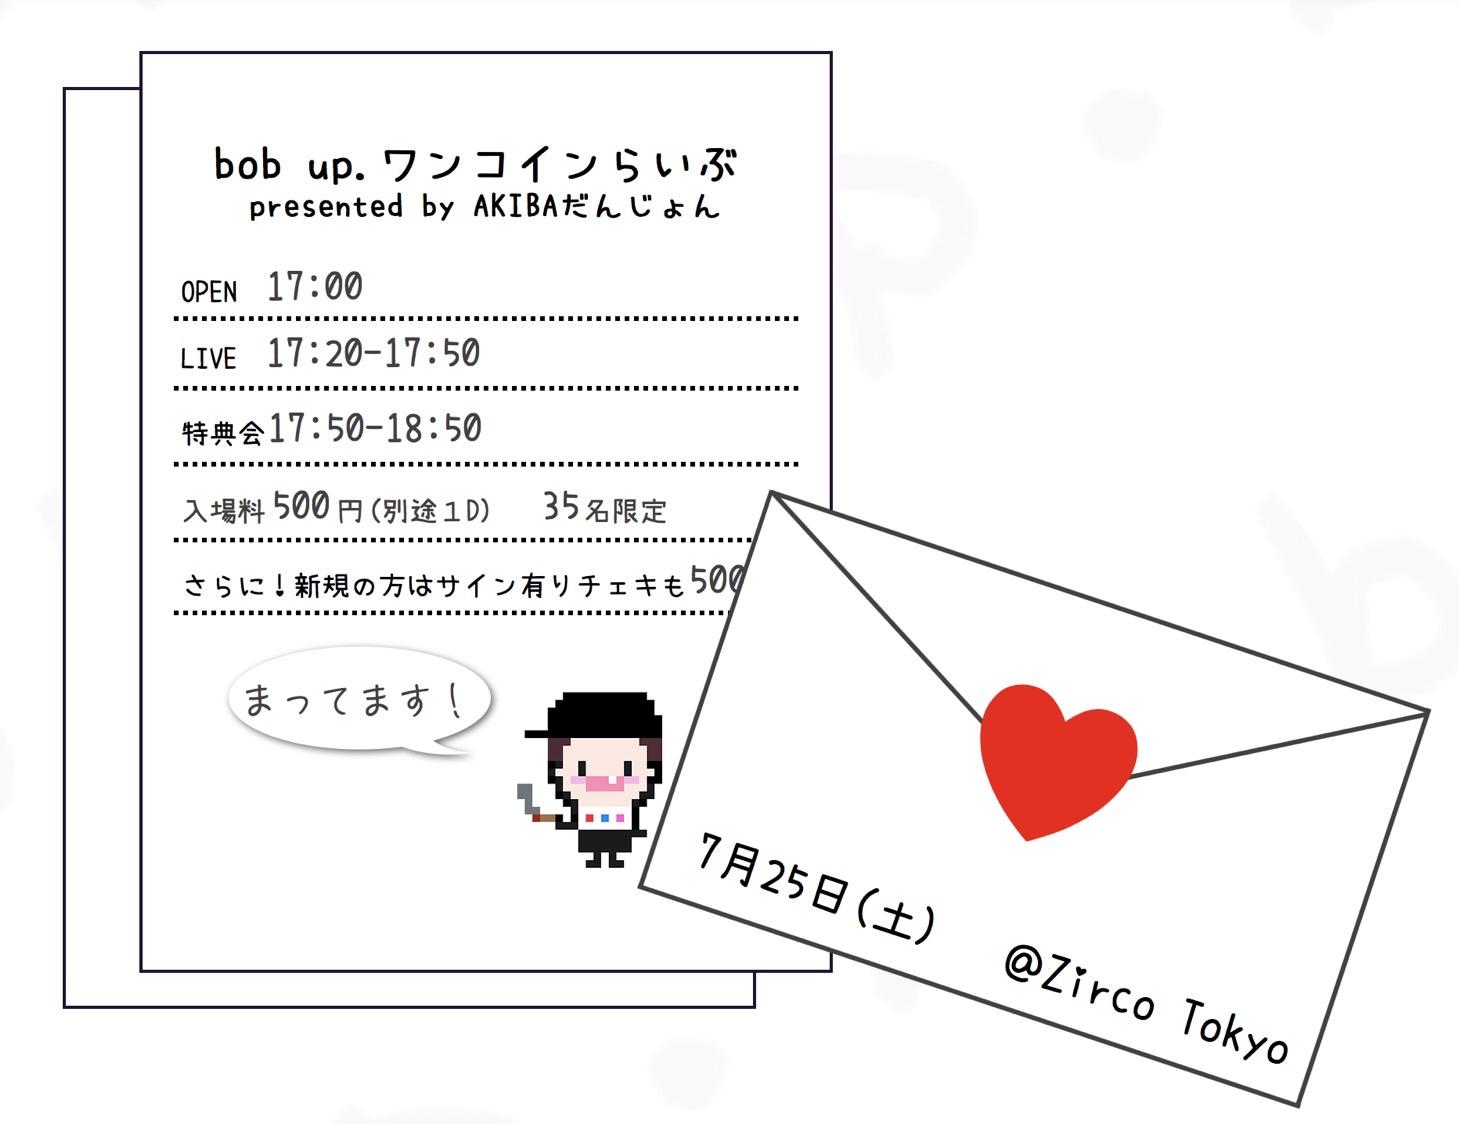 bob up.ワンコイン単独公演presented by AKIBAだんじょん